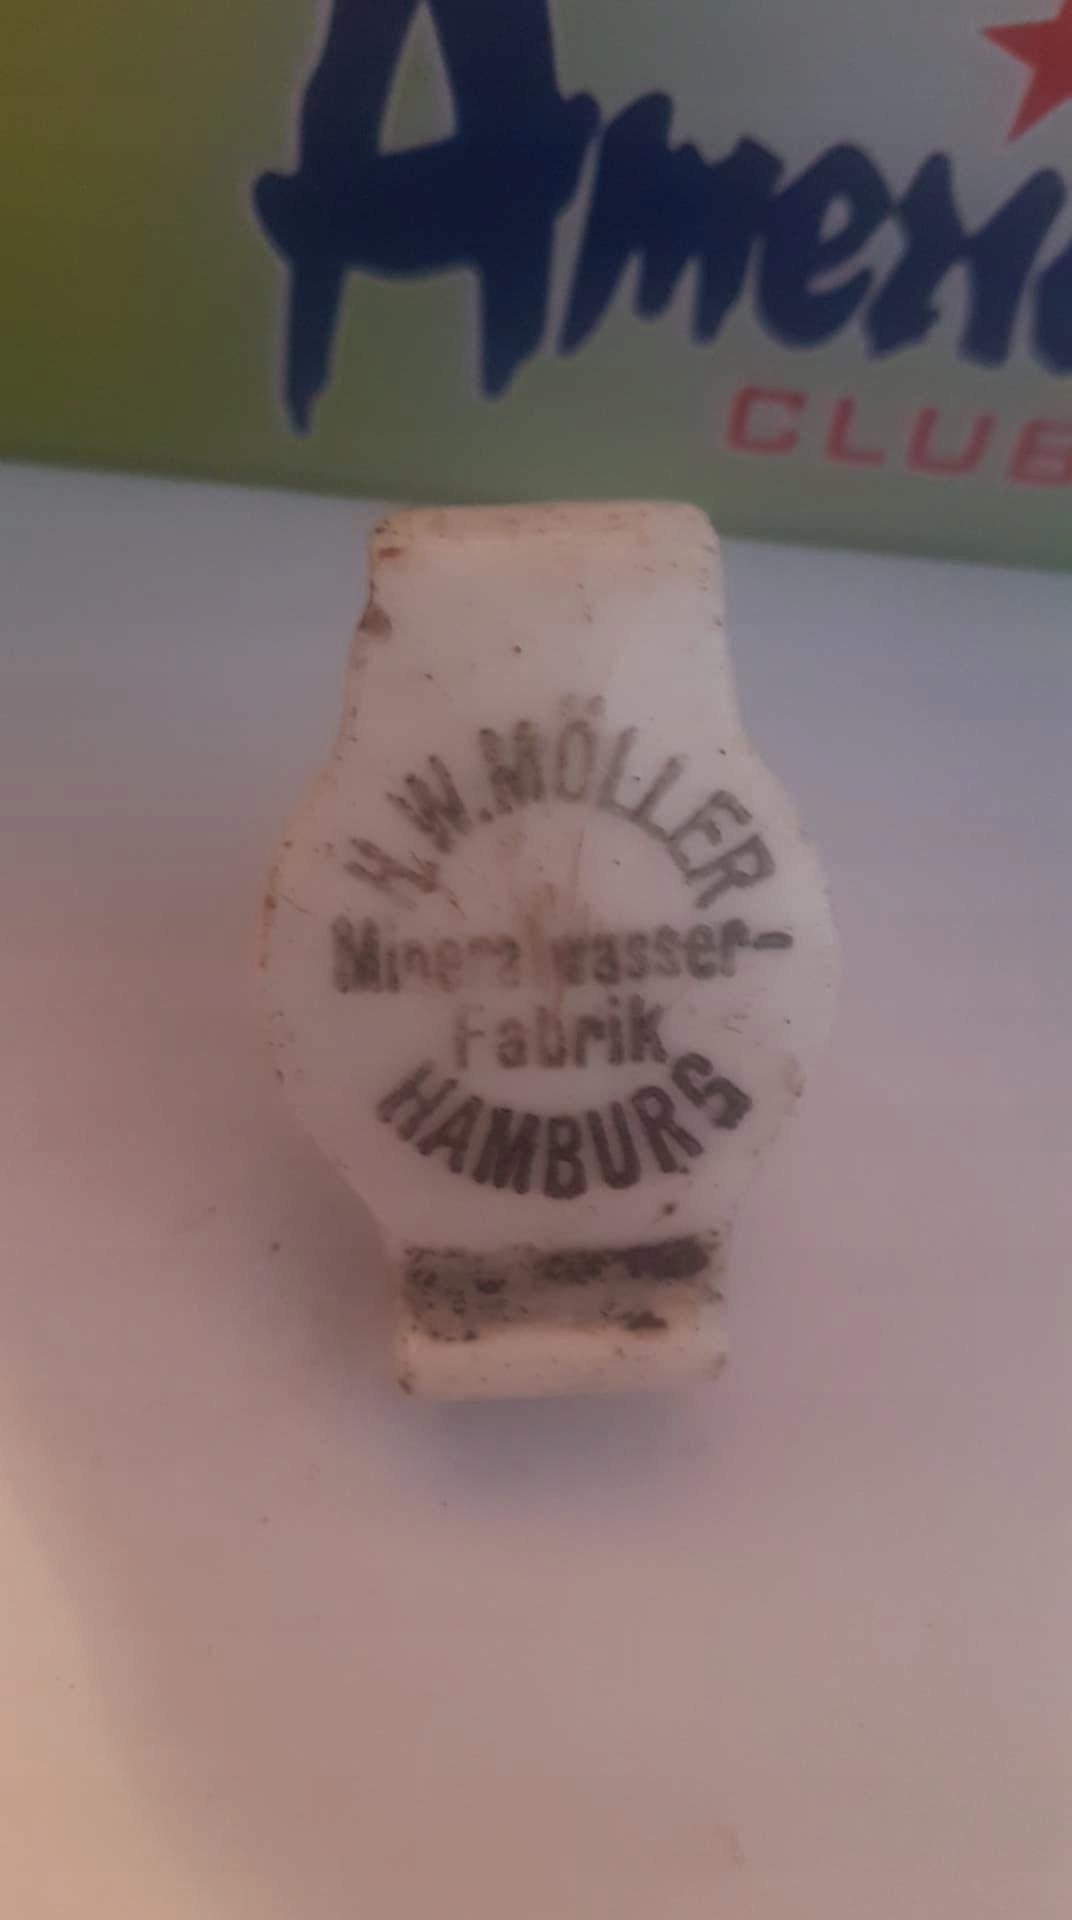 Porcelanka Hamburs